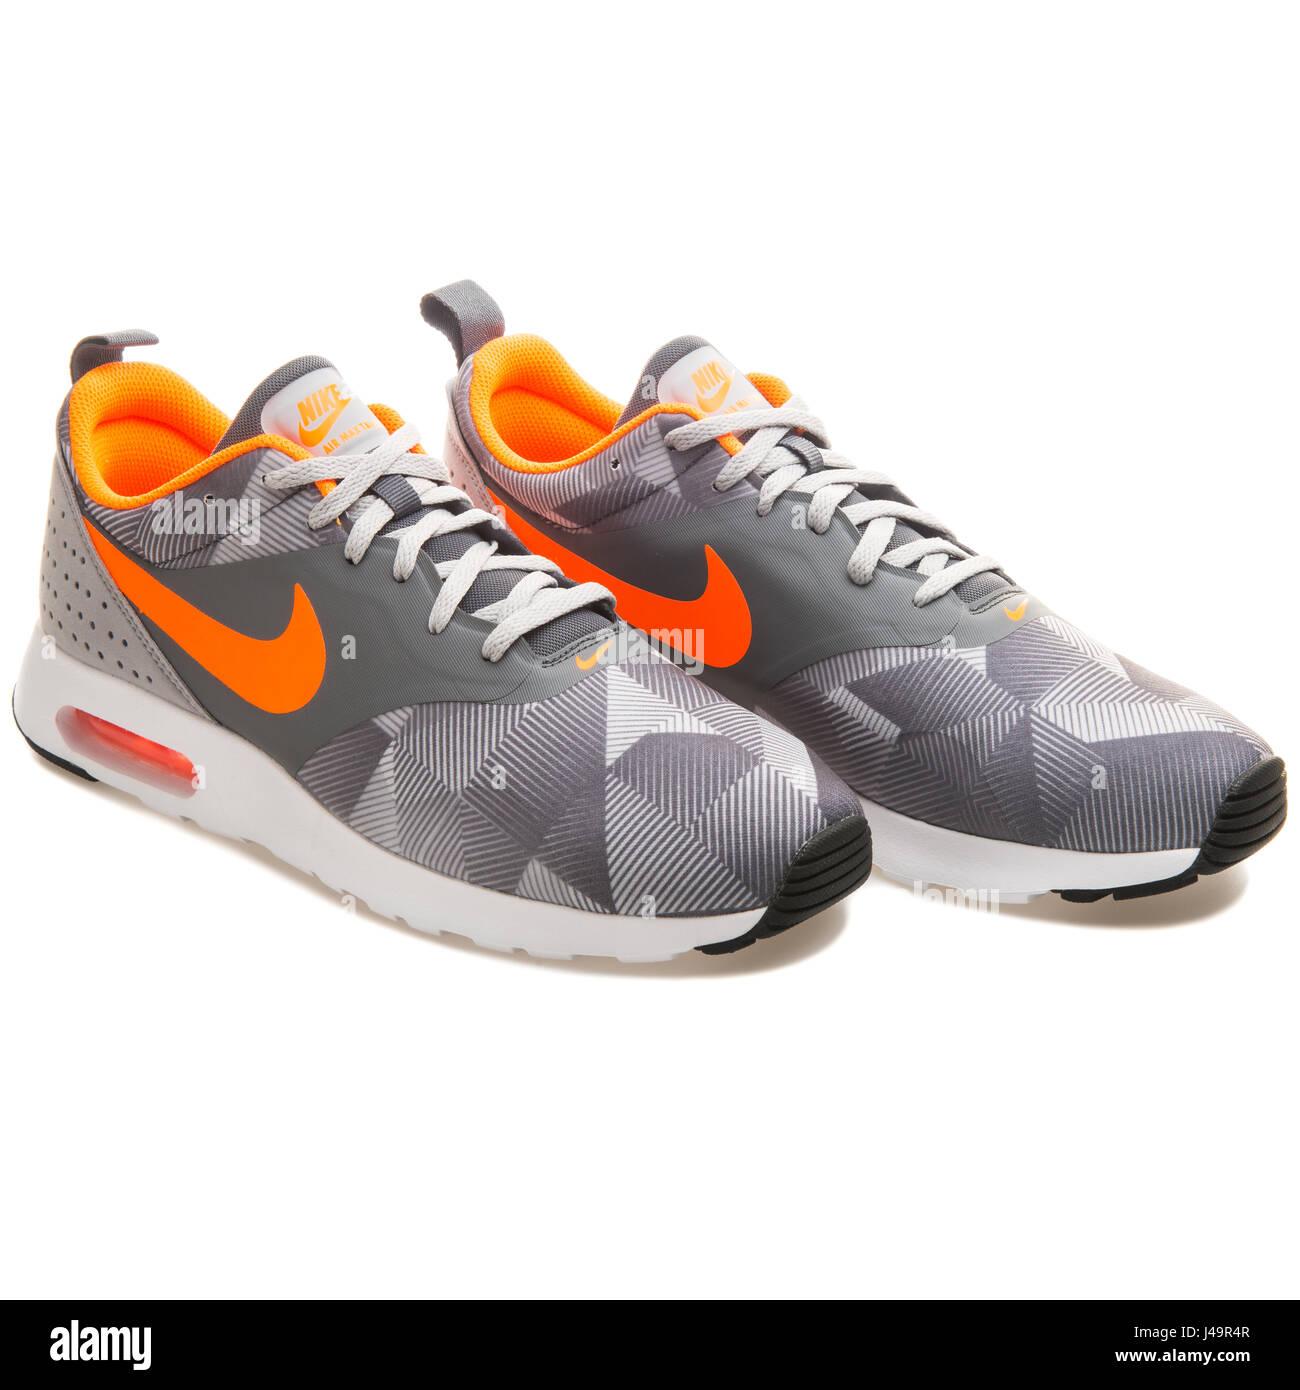 norway nike air max tavas orange gris daf21 79595